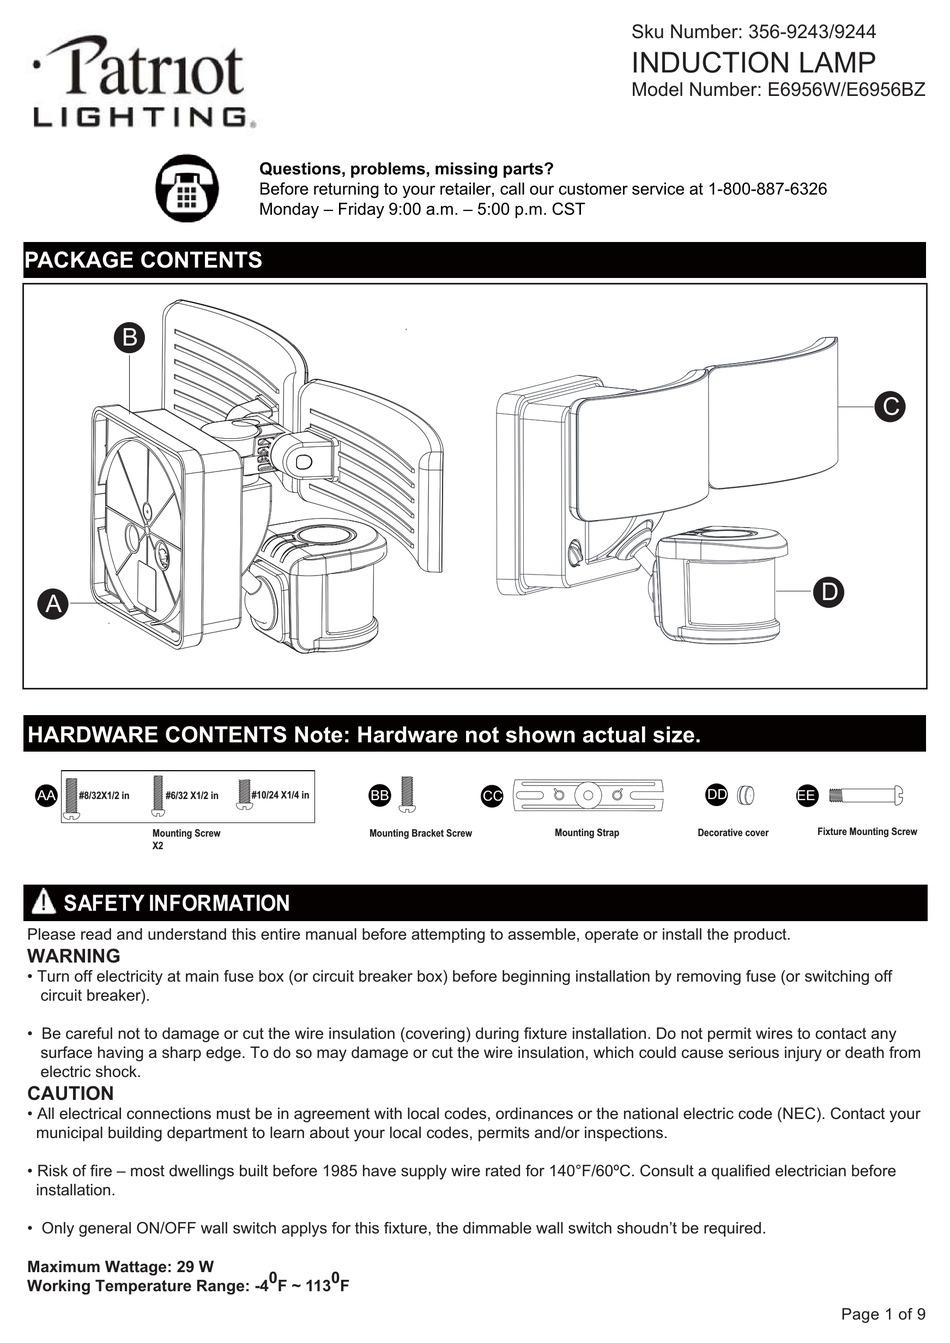 patriot lighting e6956w manual pdf